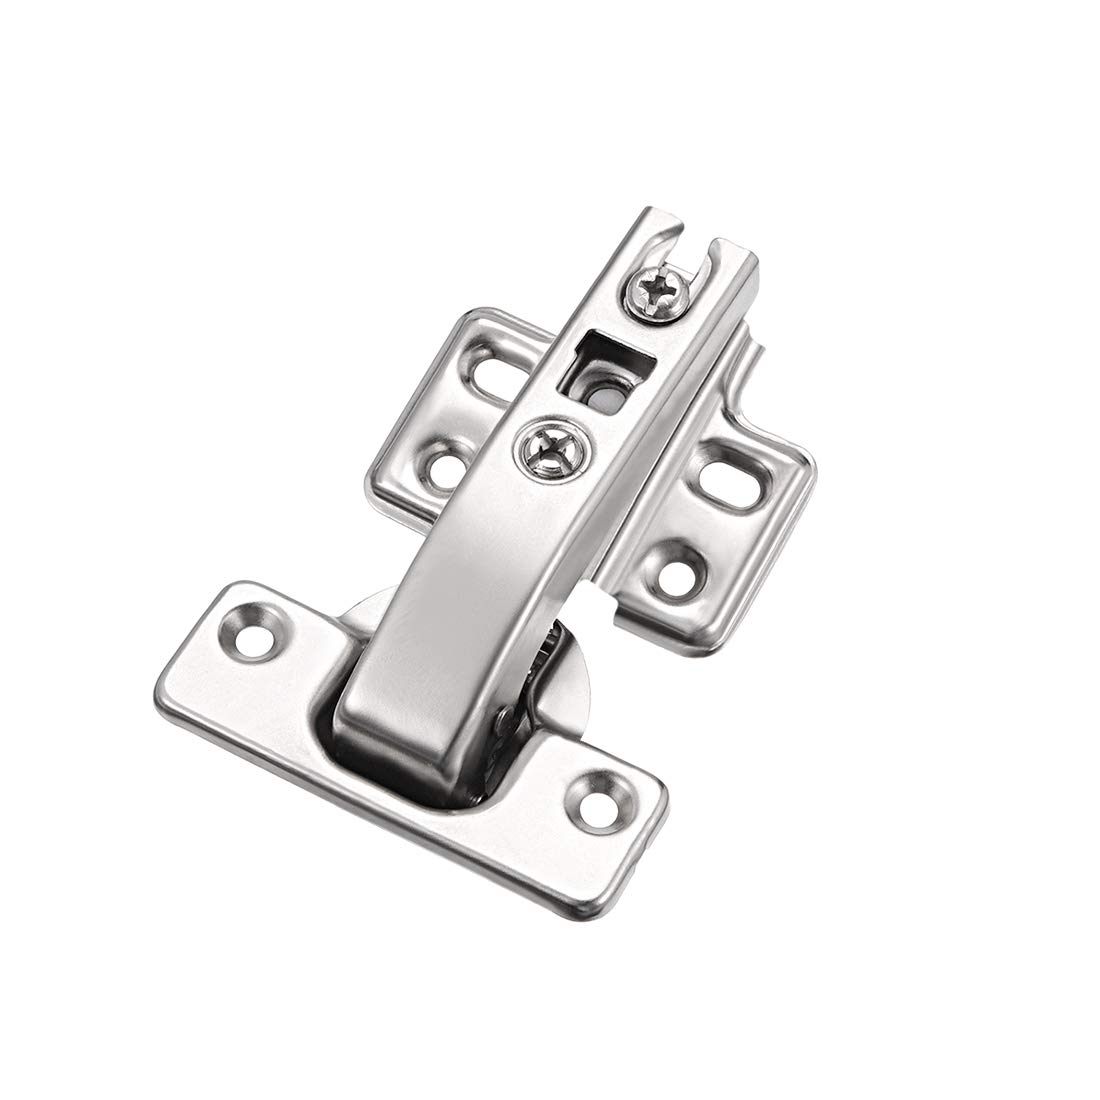 uxcell/® 90 Degree Hinges Double Cabinet Hidden Kitchen Buffering Angle Folding Door Hinge